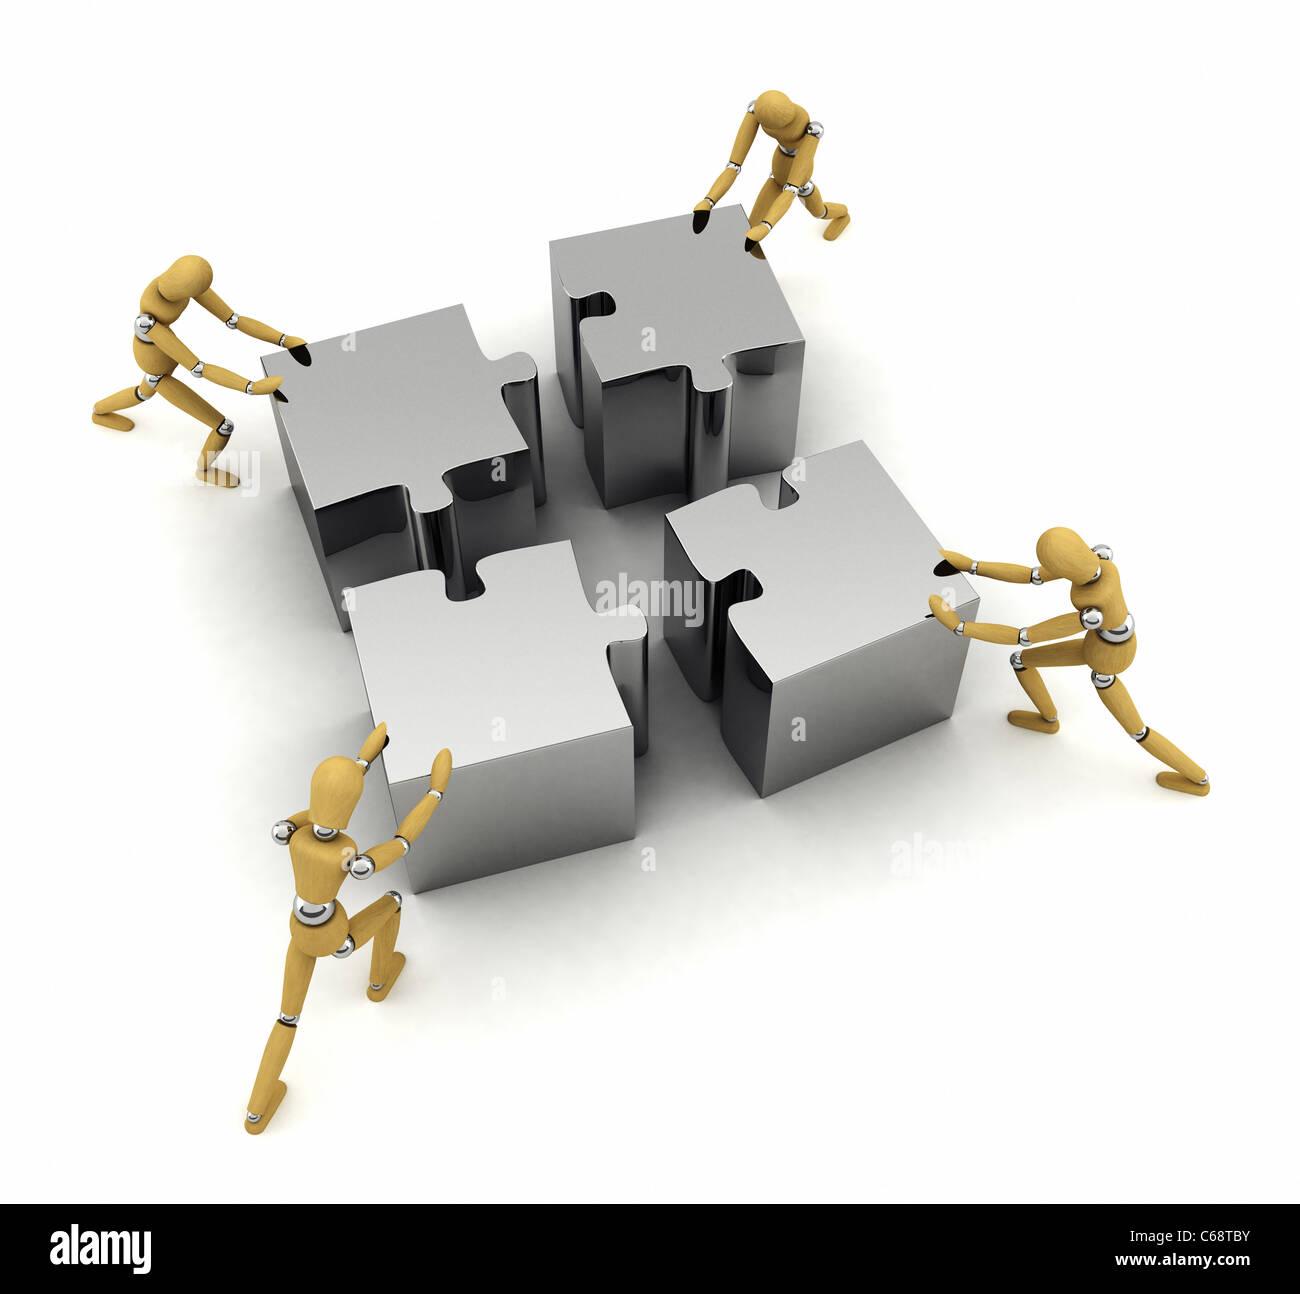 Teamwork concept - Stock Image